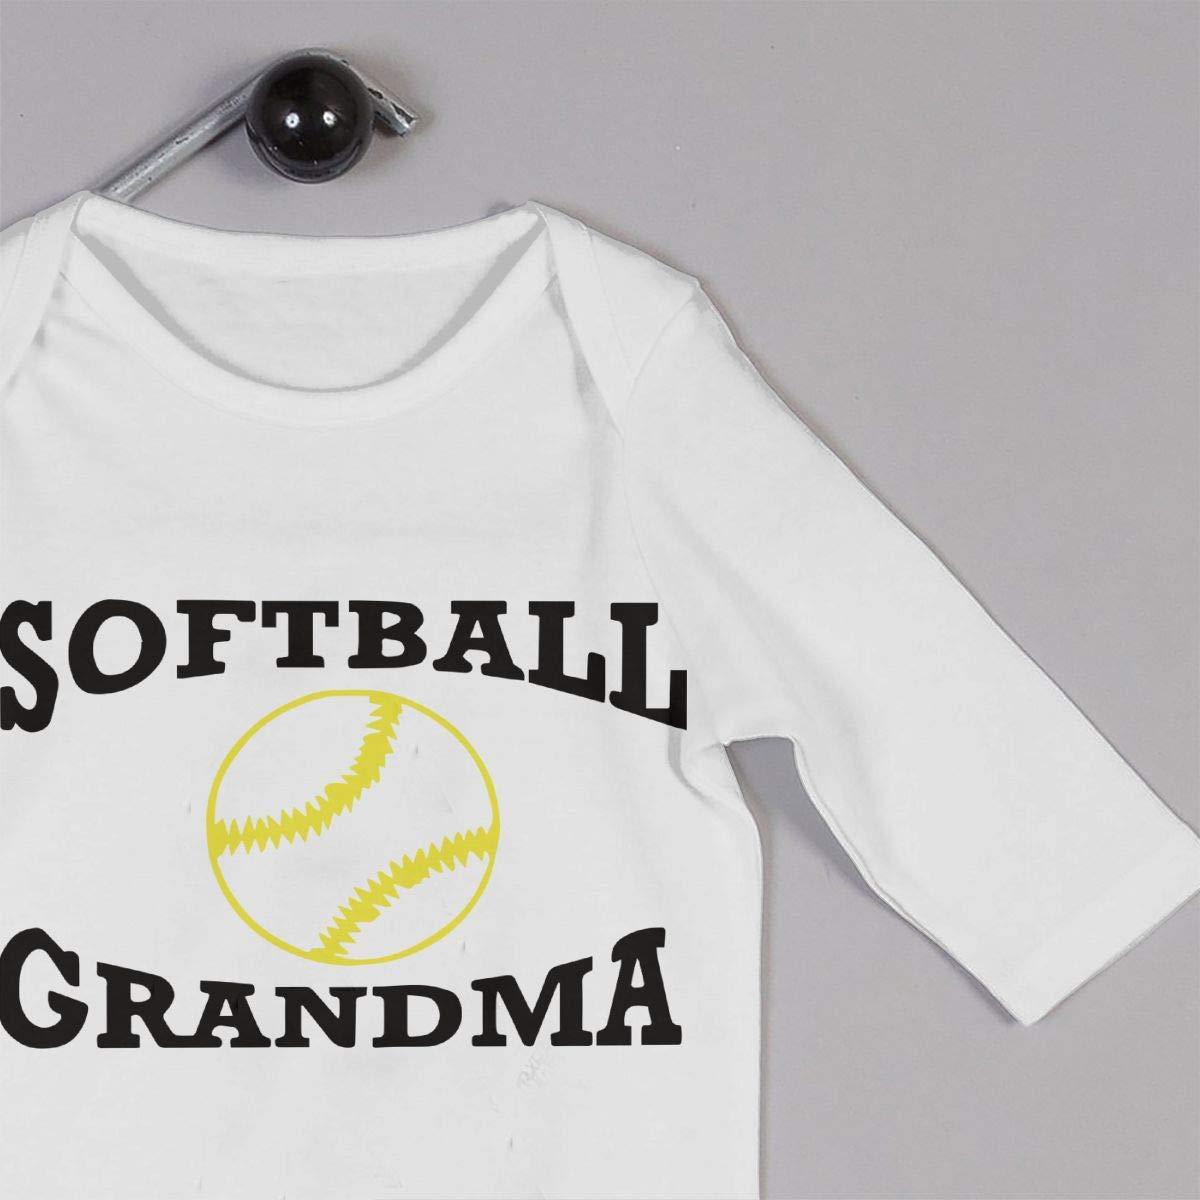 UGFGF-S3 Softball Grandma Toddler Baby Long Sleeve Bodysuit Infant Romper Jumpsuit Onsies